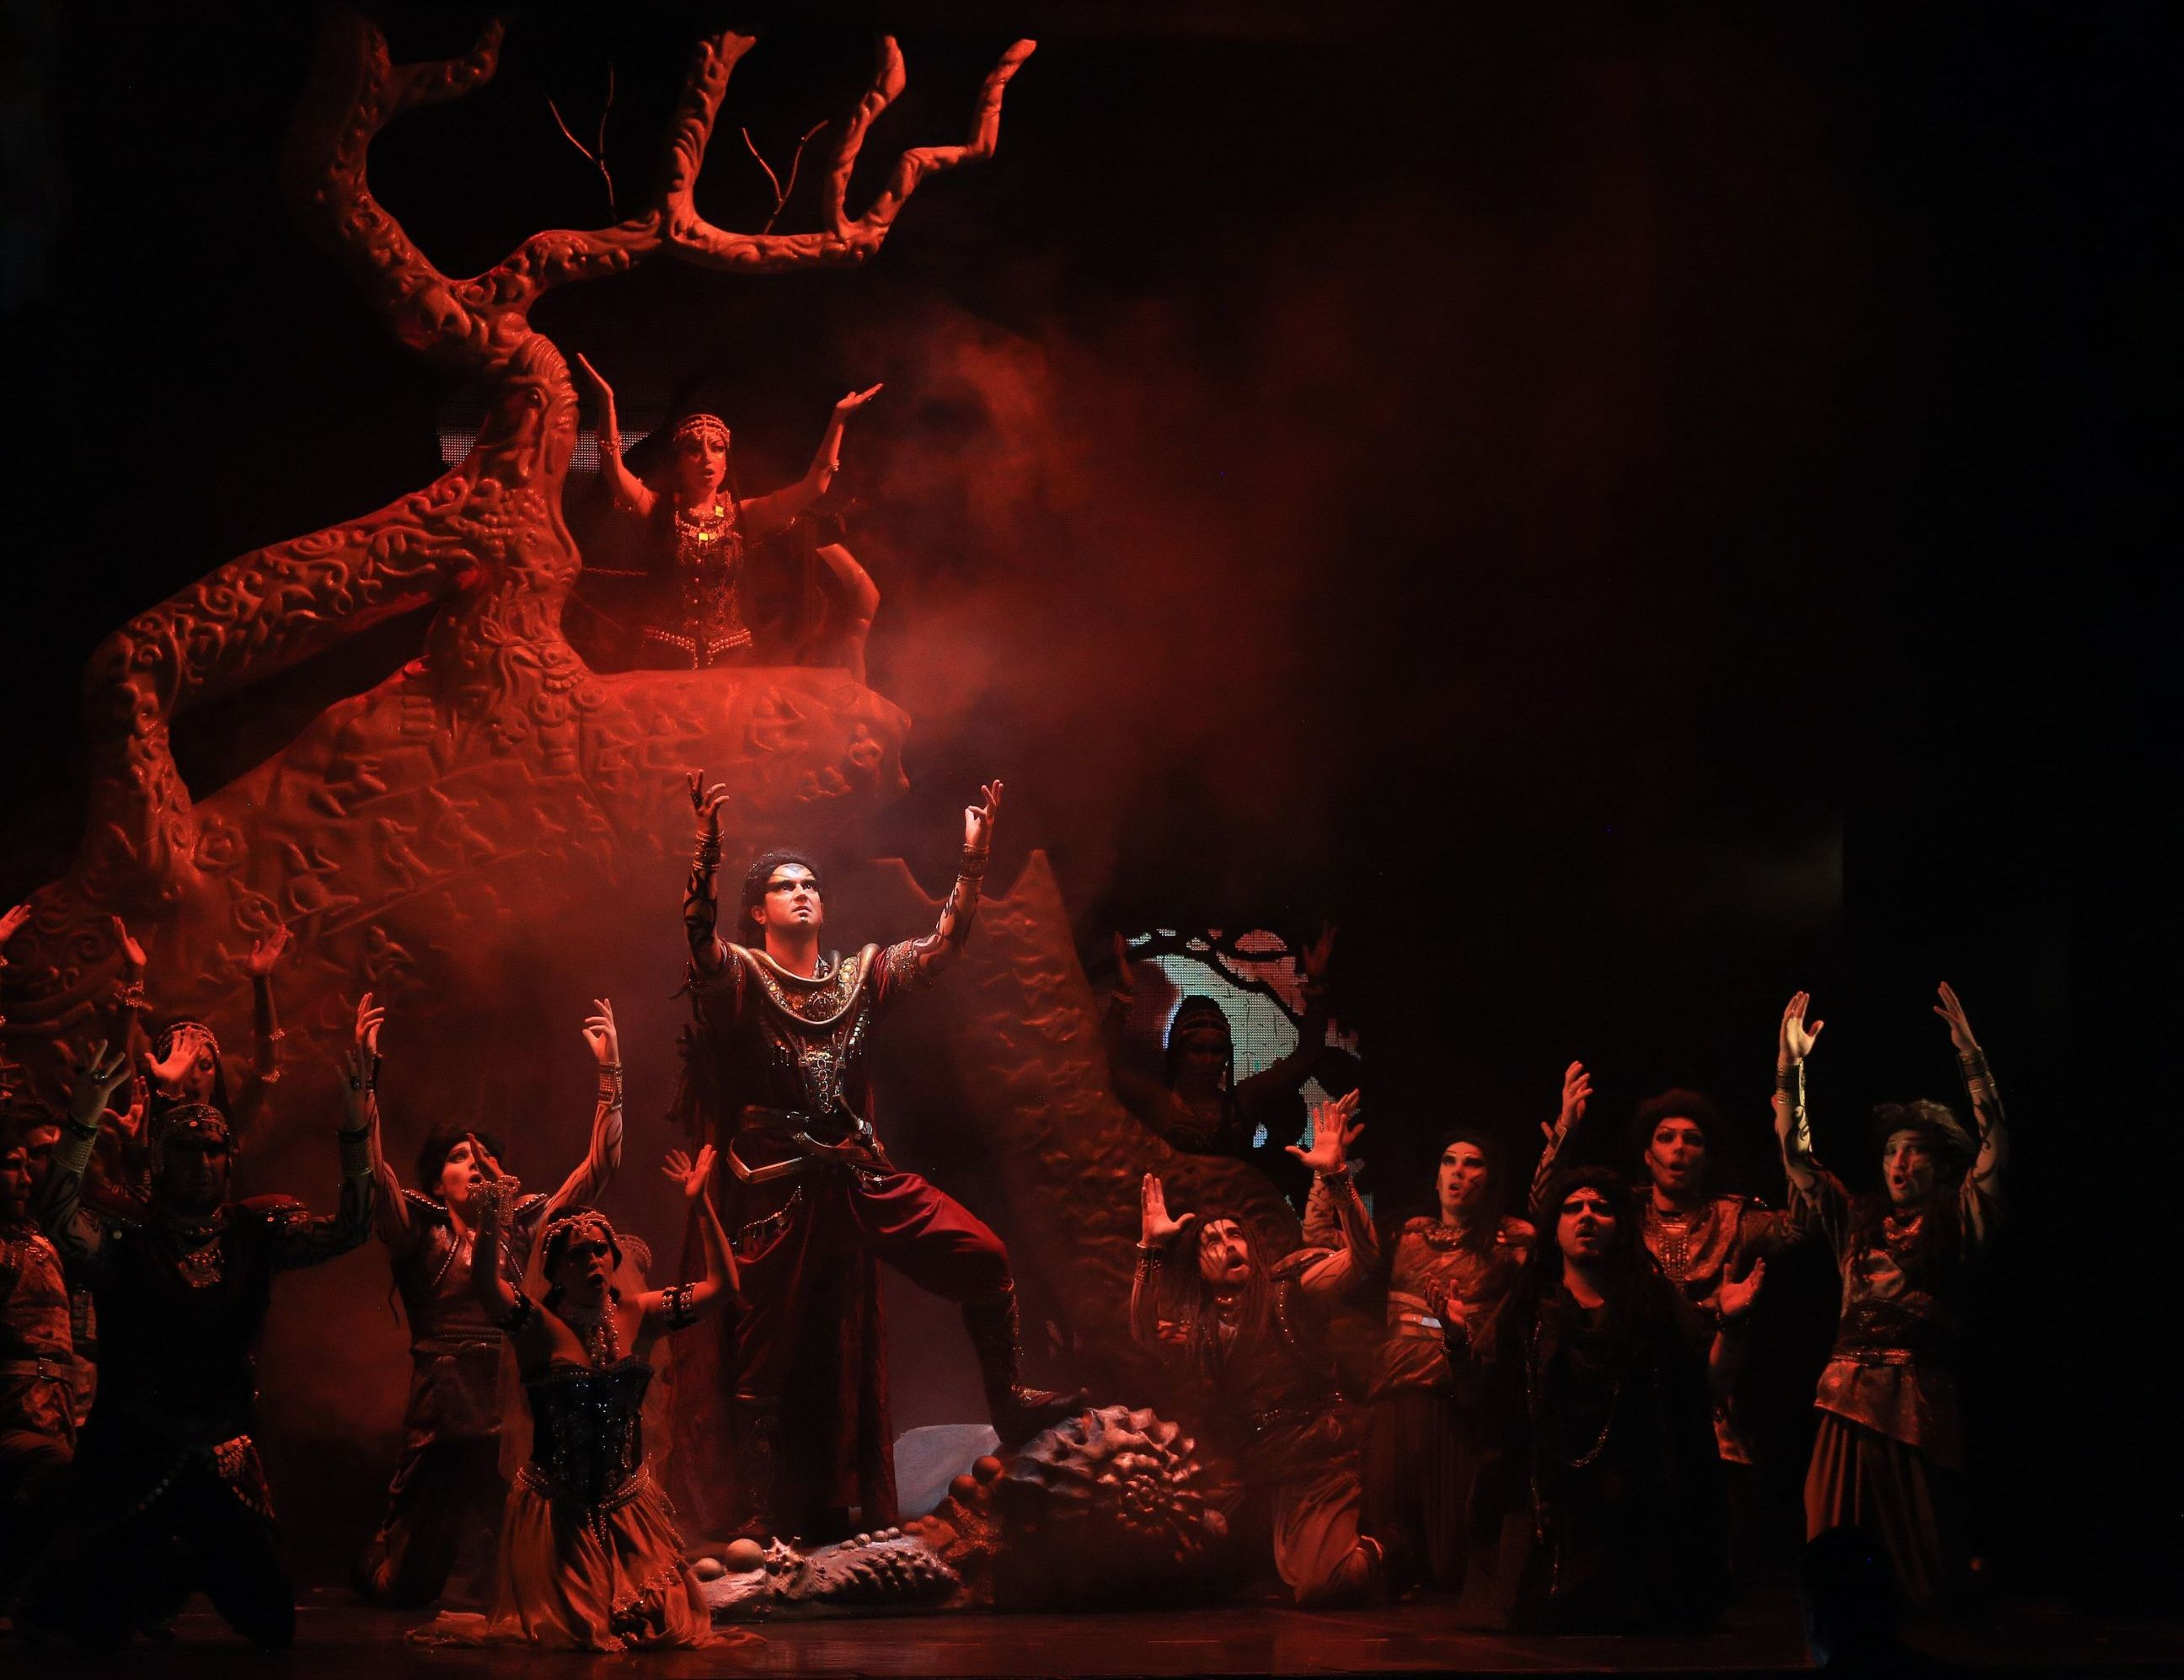 Гастроли театра Санктъ-Петербургъ Опера пройдут в Нур-Султане